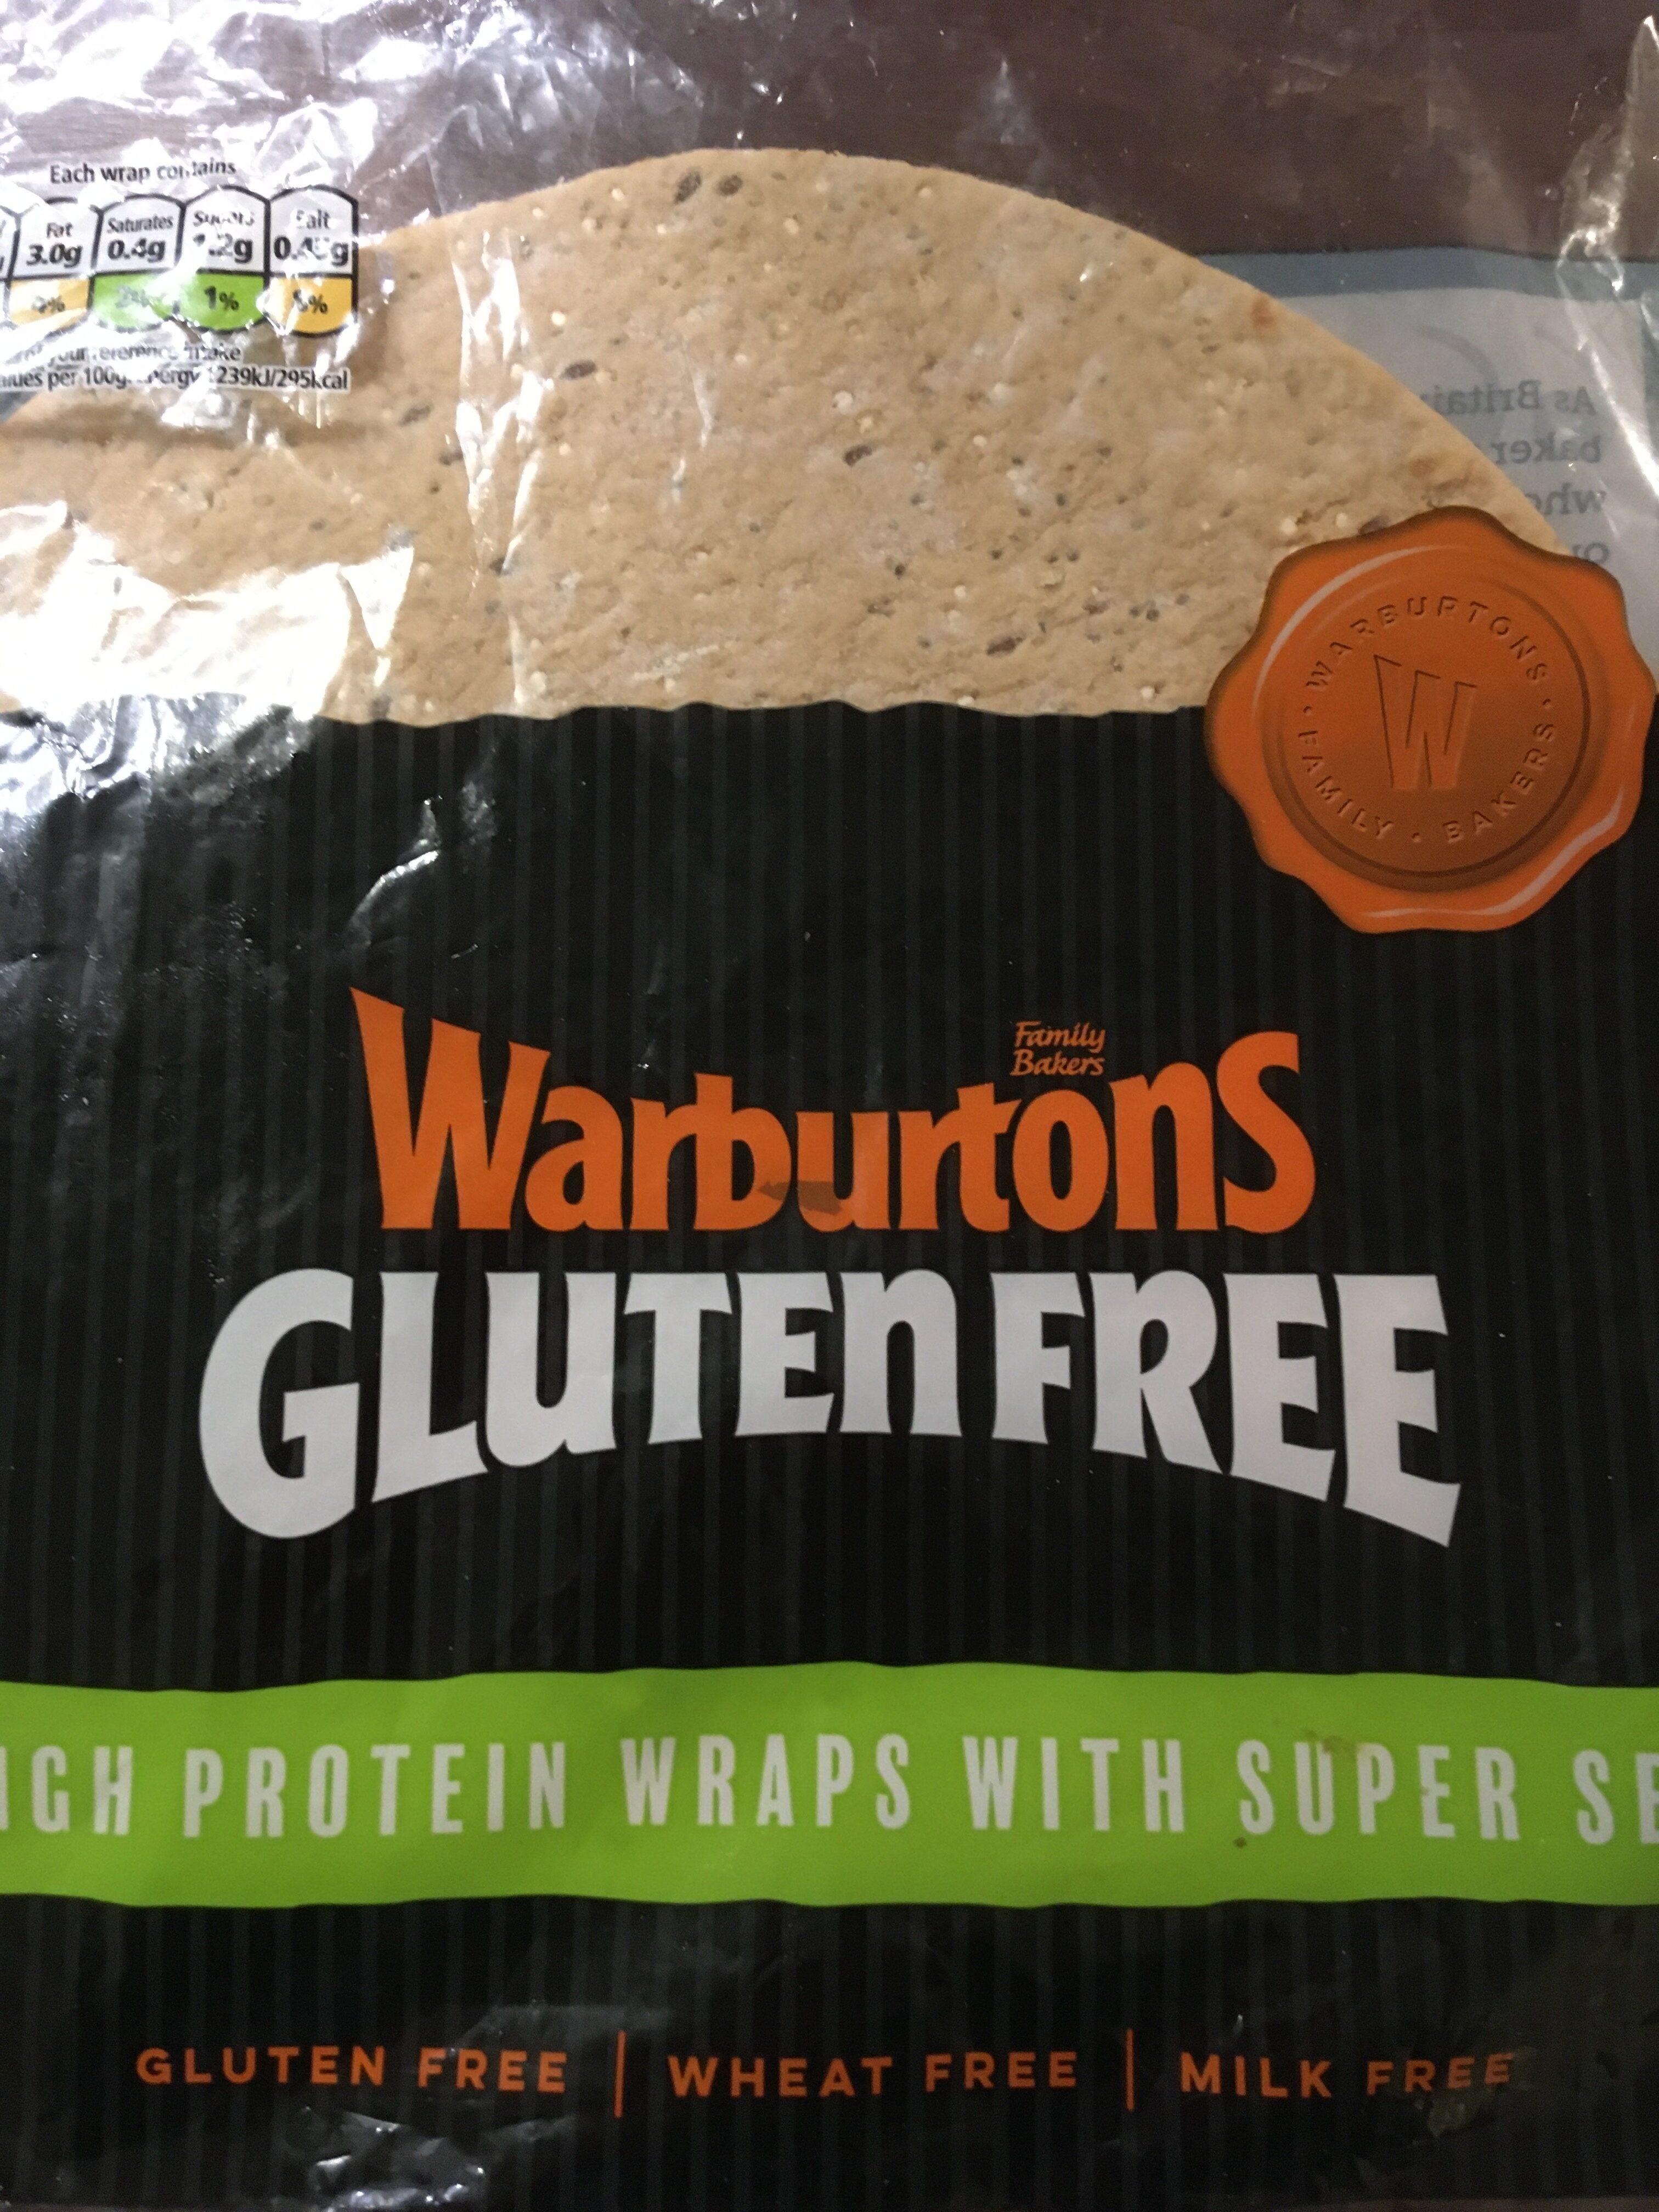 Warburtons Gluten Free Protein Super Seeds 4 Wraps - Product - en